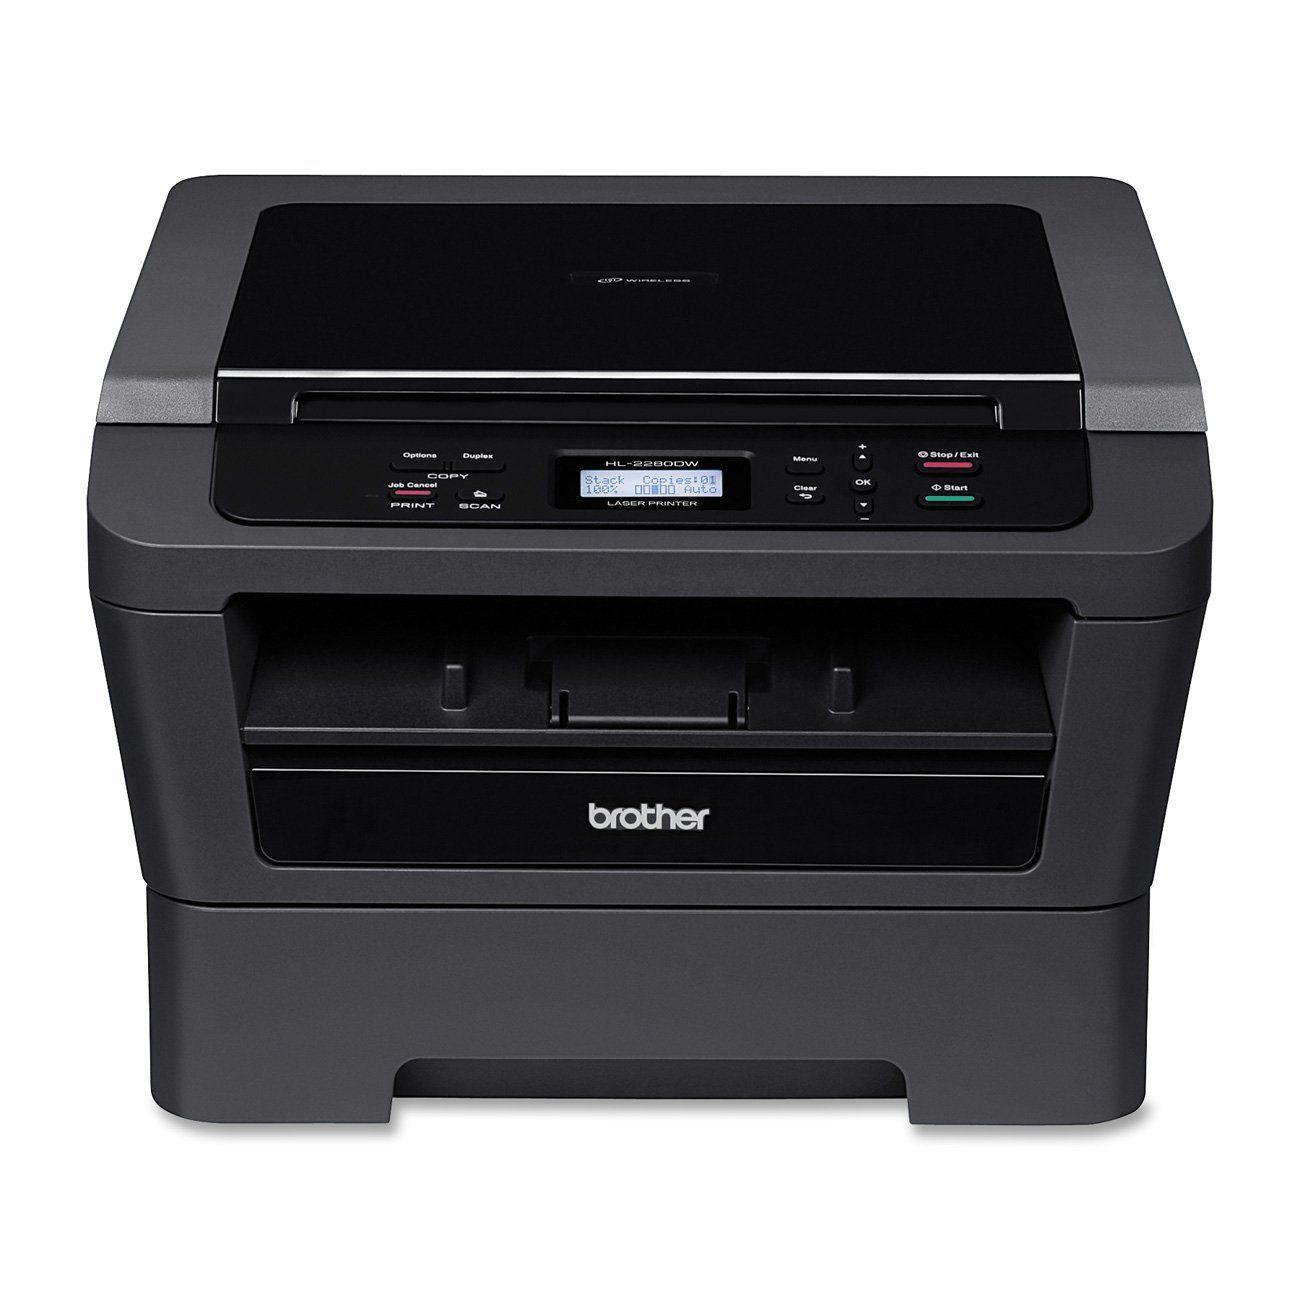 Best Home Office Laser Printer Copier Scanner: Amazon.com: Brother Printer Wireless Monochrome Printer